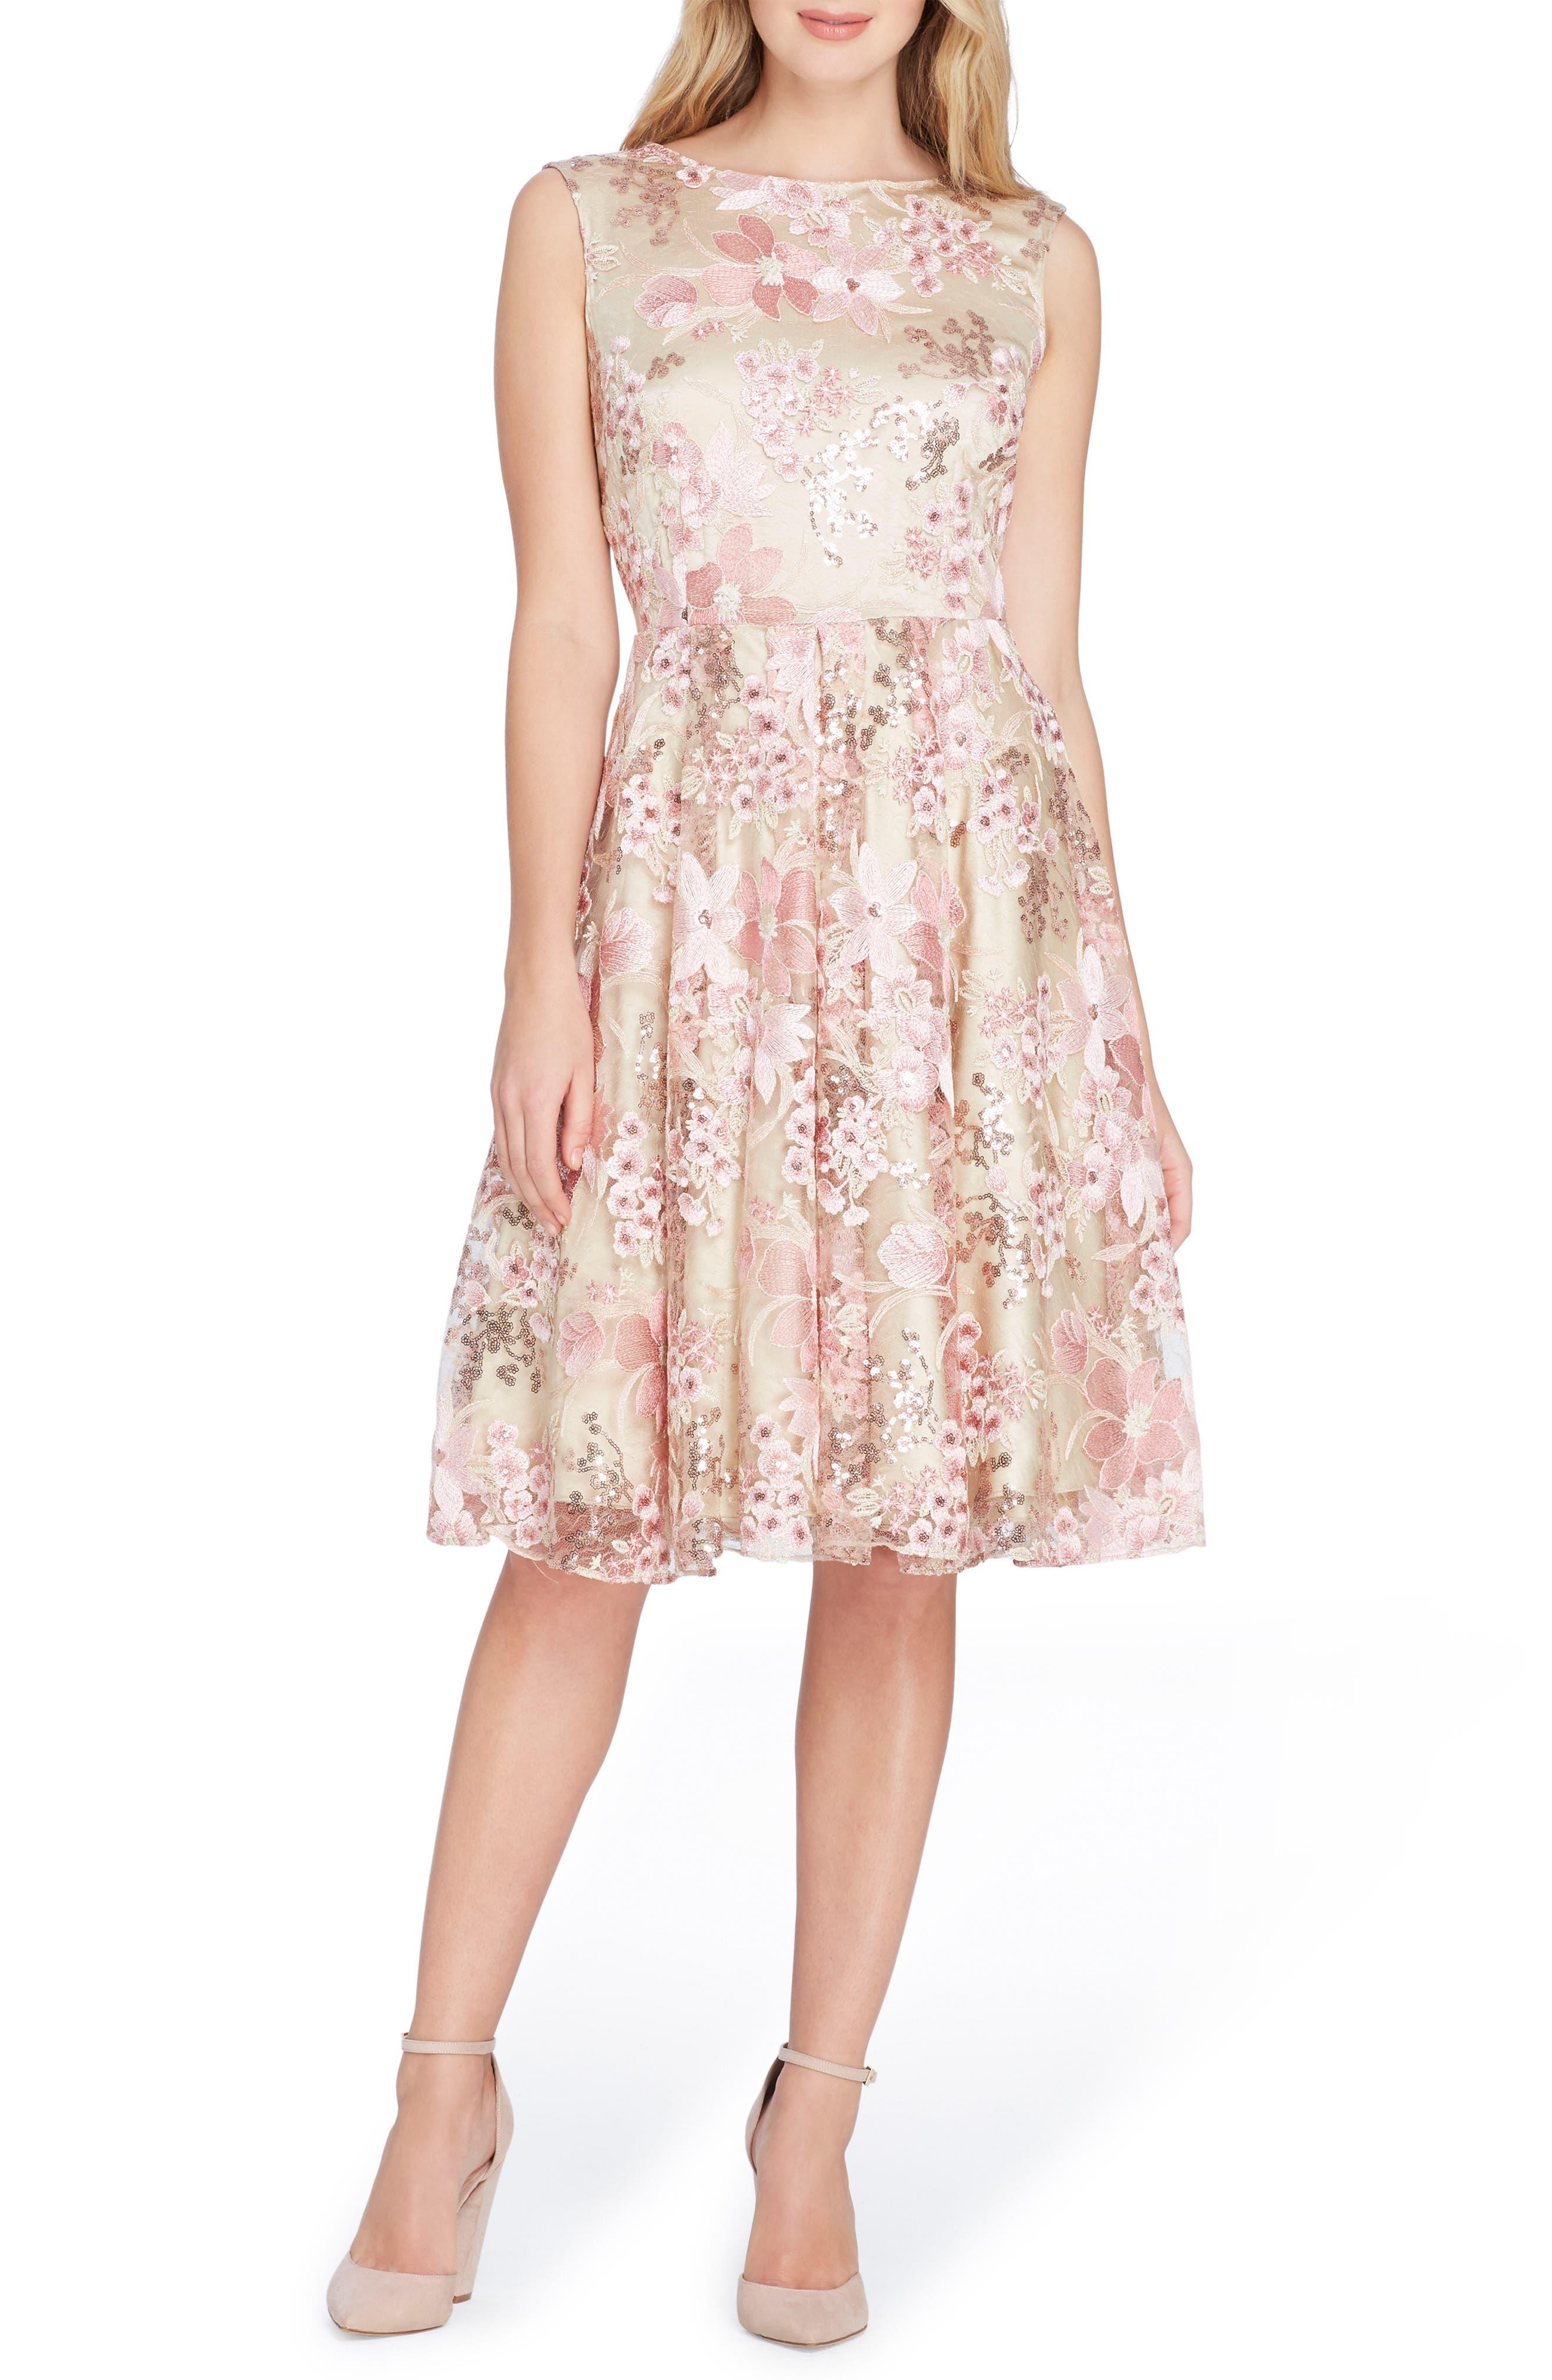 Sleeveless Embroidery Fit & Flare Dress,                         Main,                         color, Nude/ Tea Rose/ Blush